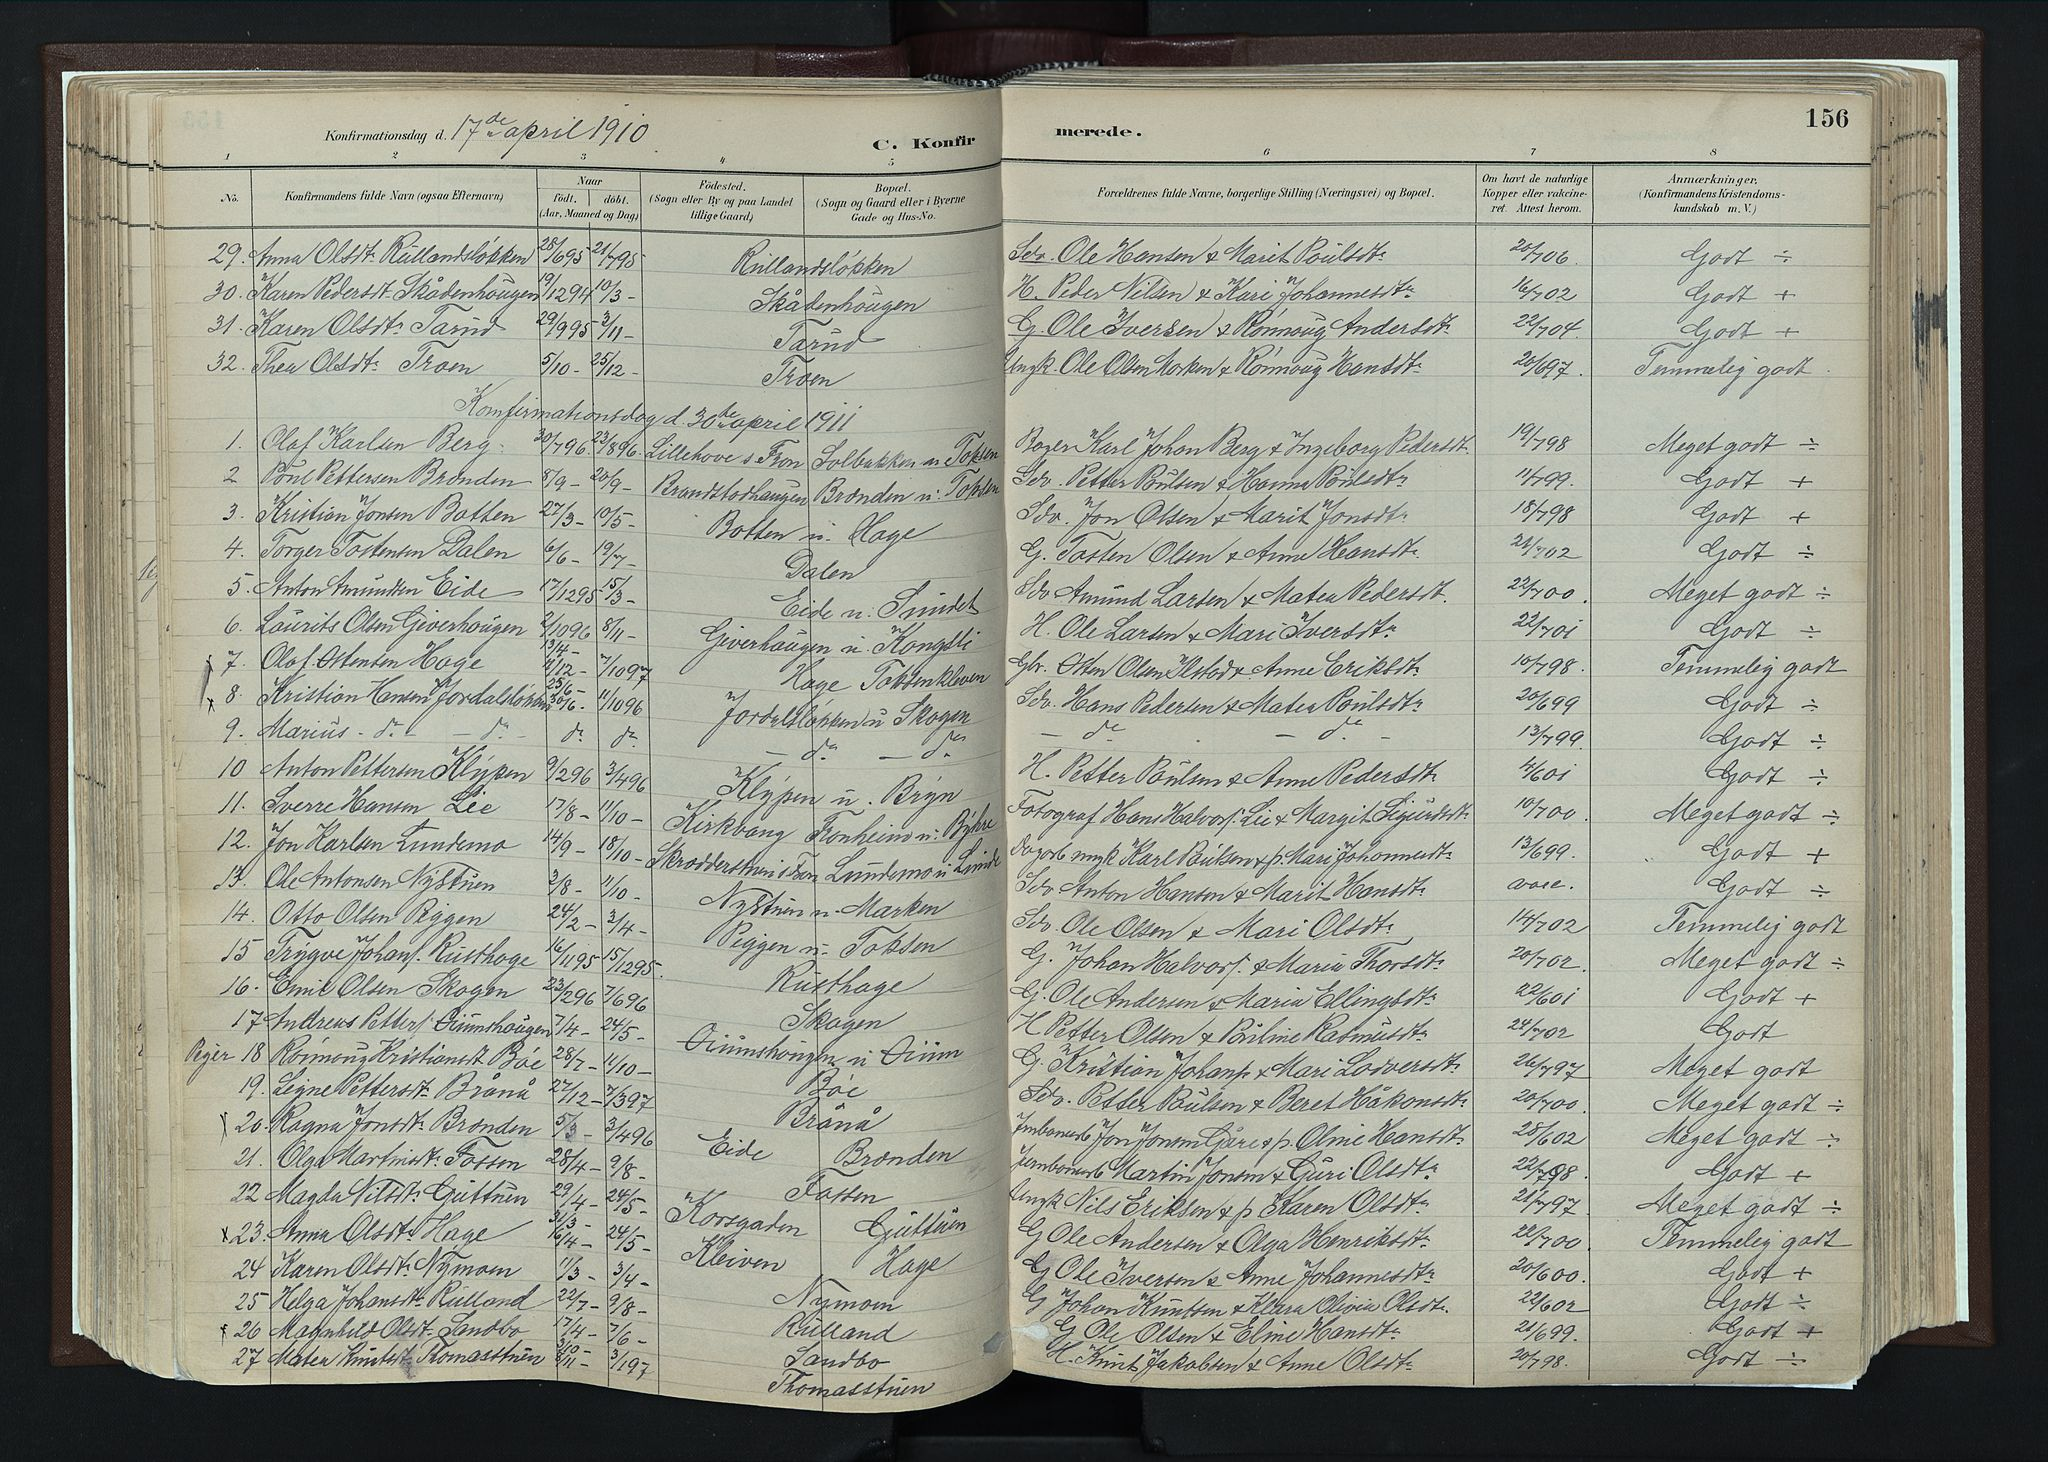 SAH, Nord-Fron prestekontor, Ministerialbok nr. 4, 1884-1914, s. 156